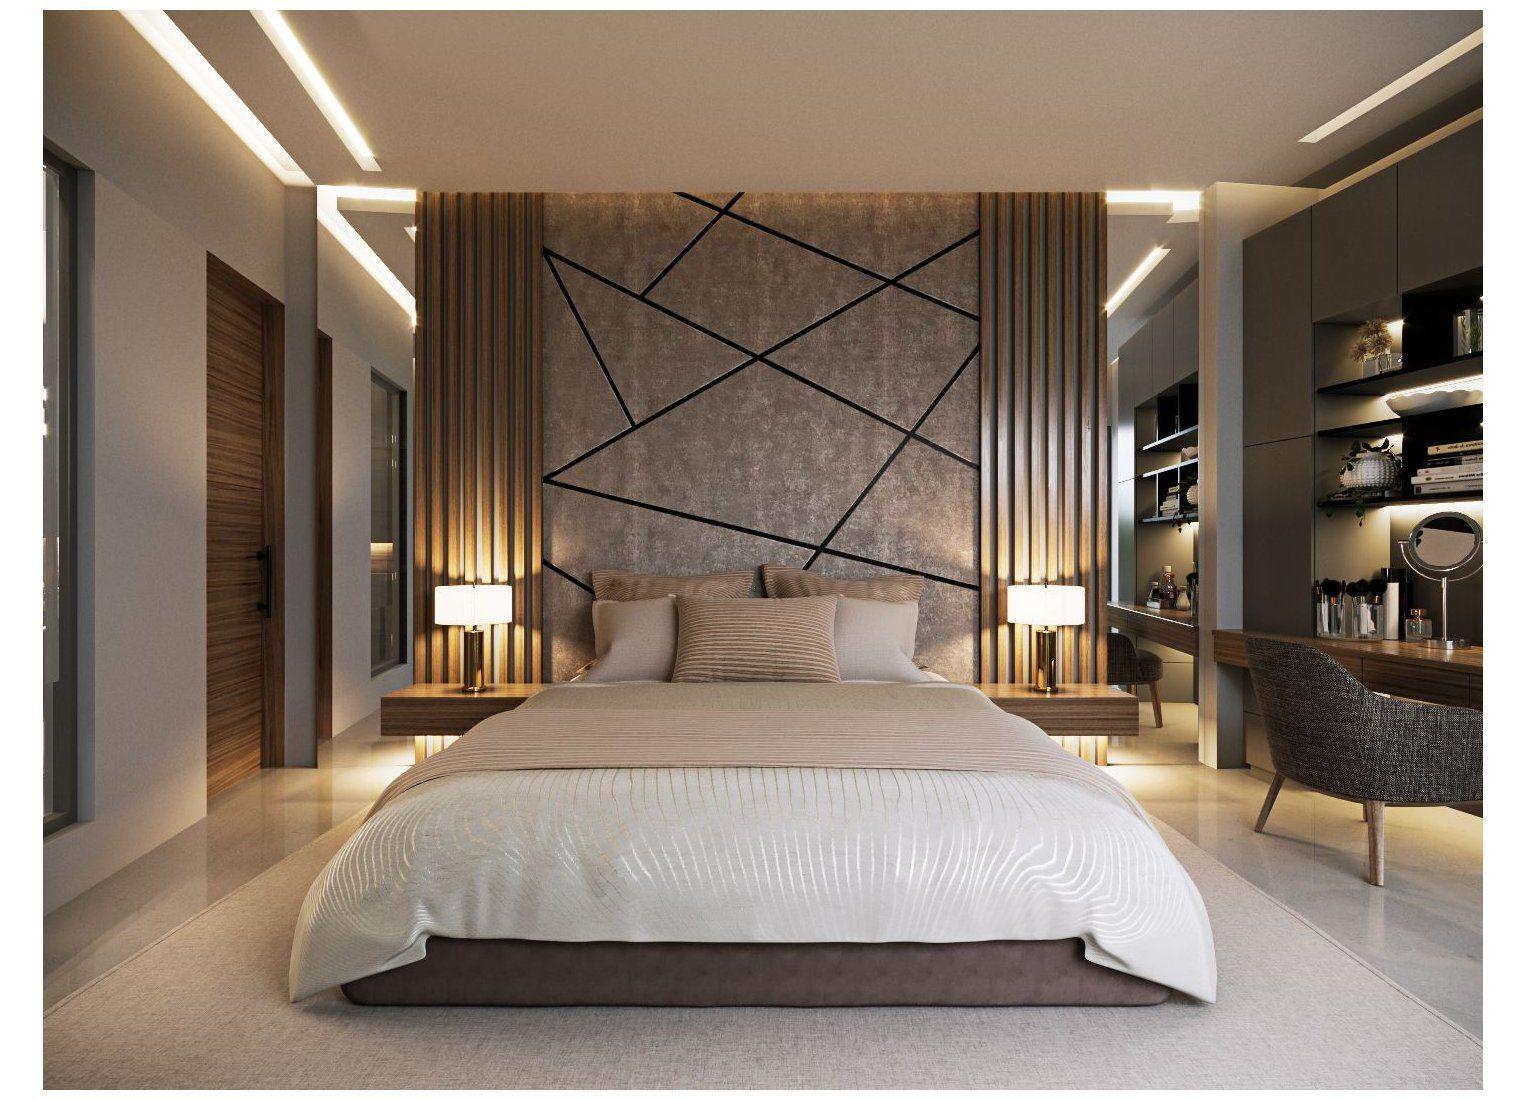 Master Bedroom Master Bedroom Furniture Design Modern Masterbedr In 2021 Luxury Master Bedroom Design Master Bedroom Interior Design Modern Master Bedroom Design Modern design of bedroom